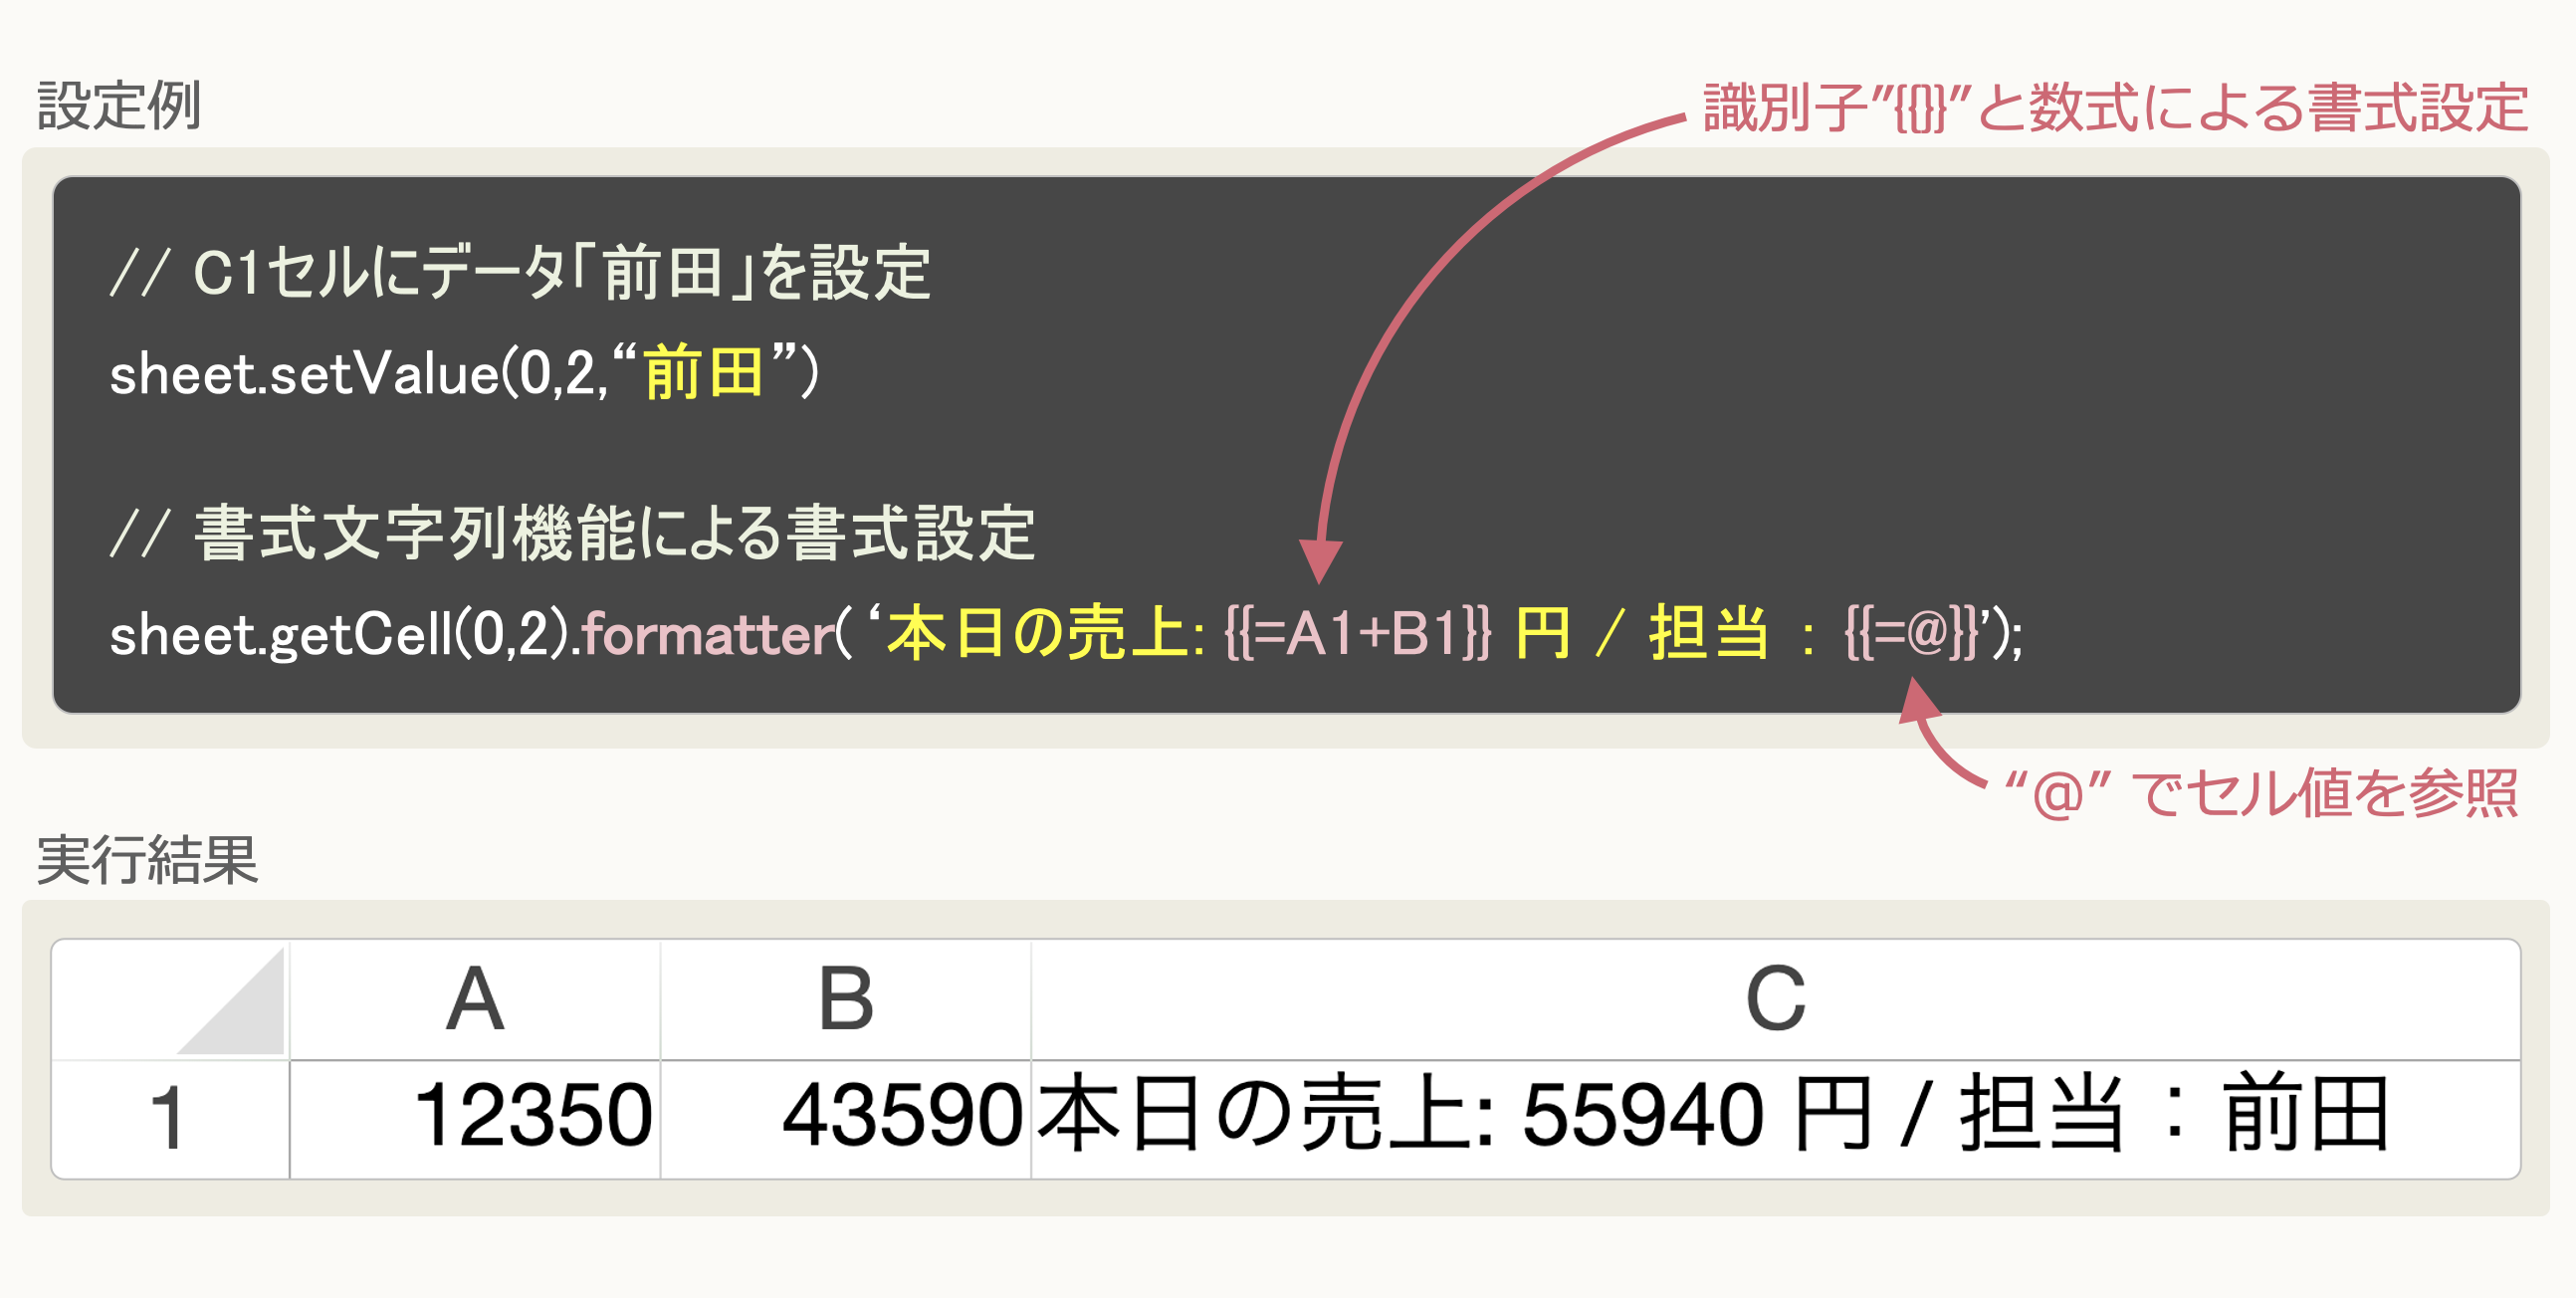 書式文字列の使用例